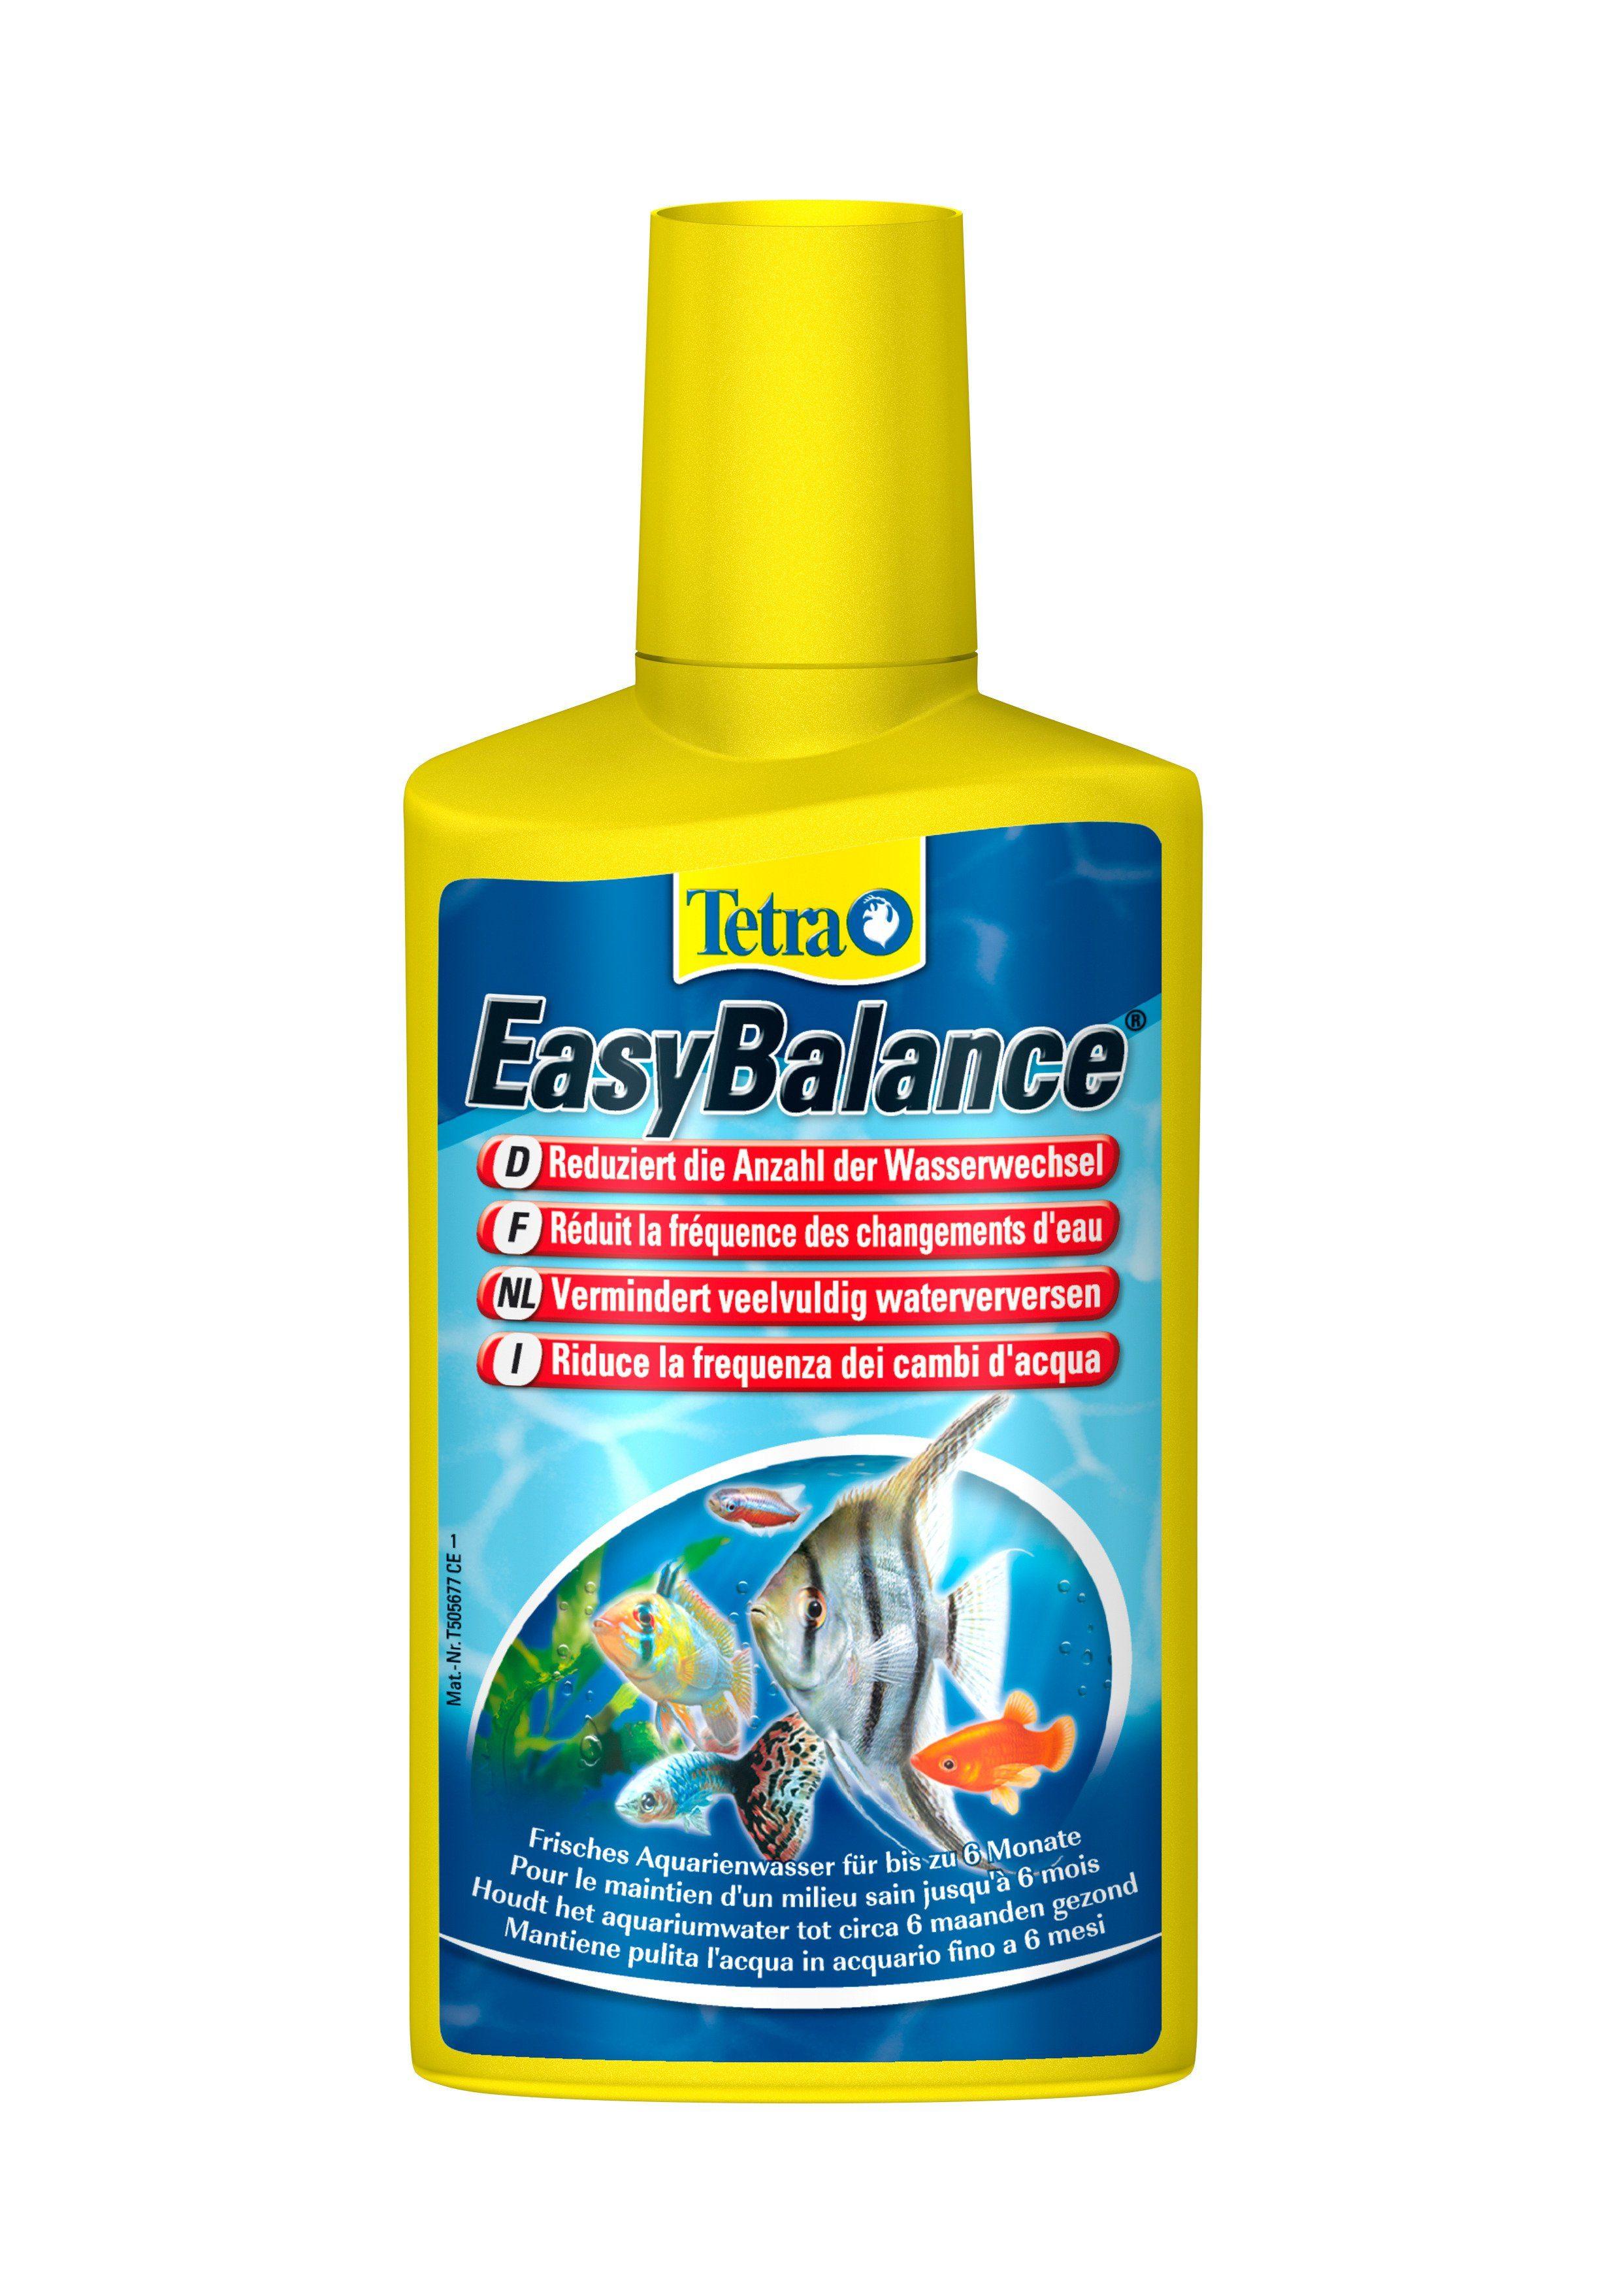 Tetra Aquariumpflege »Easy Balance«2 x 250 ml